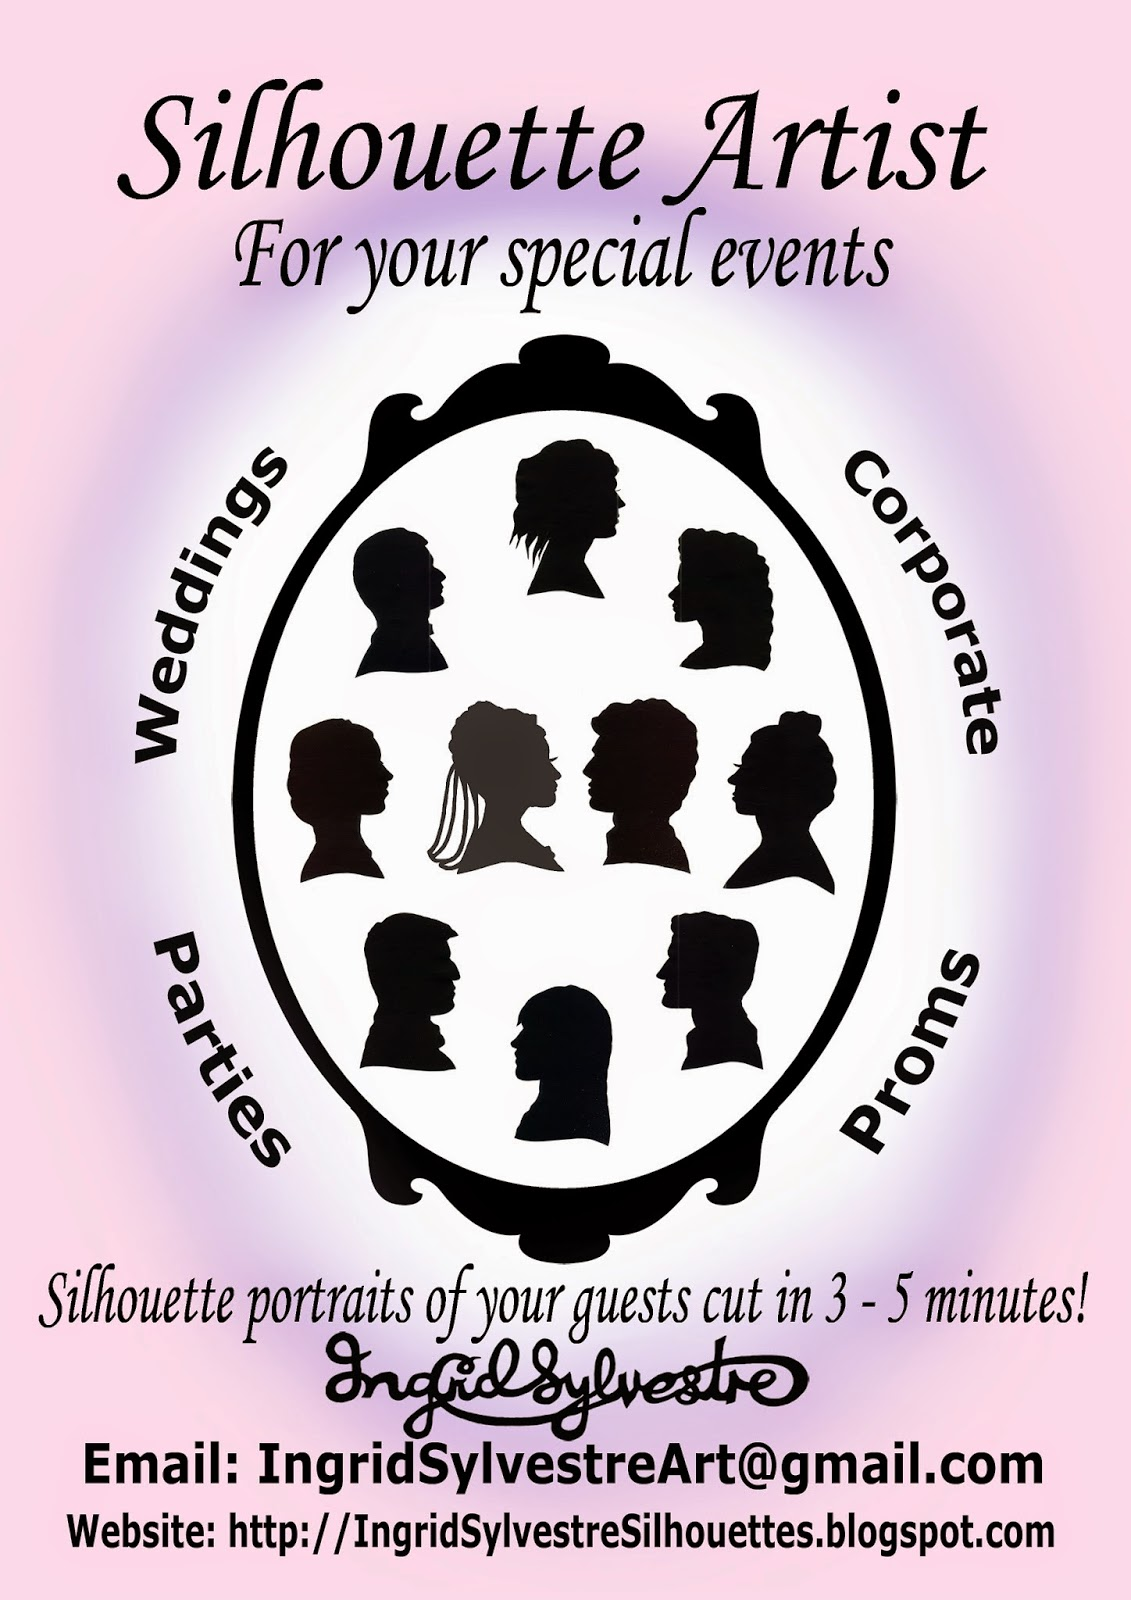 Ingrid Sylvestre Wedding Entertainment Silhouettes Caricatures Wedding Silhouettes